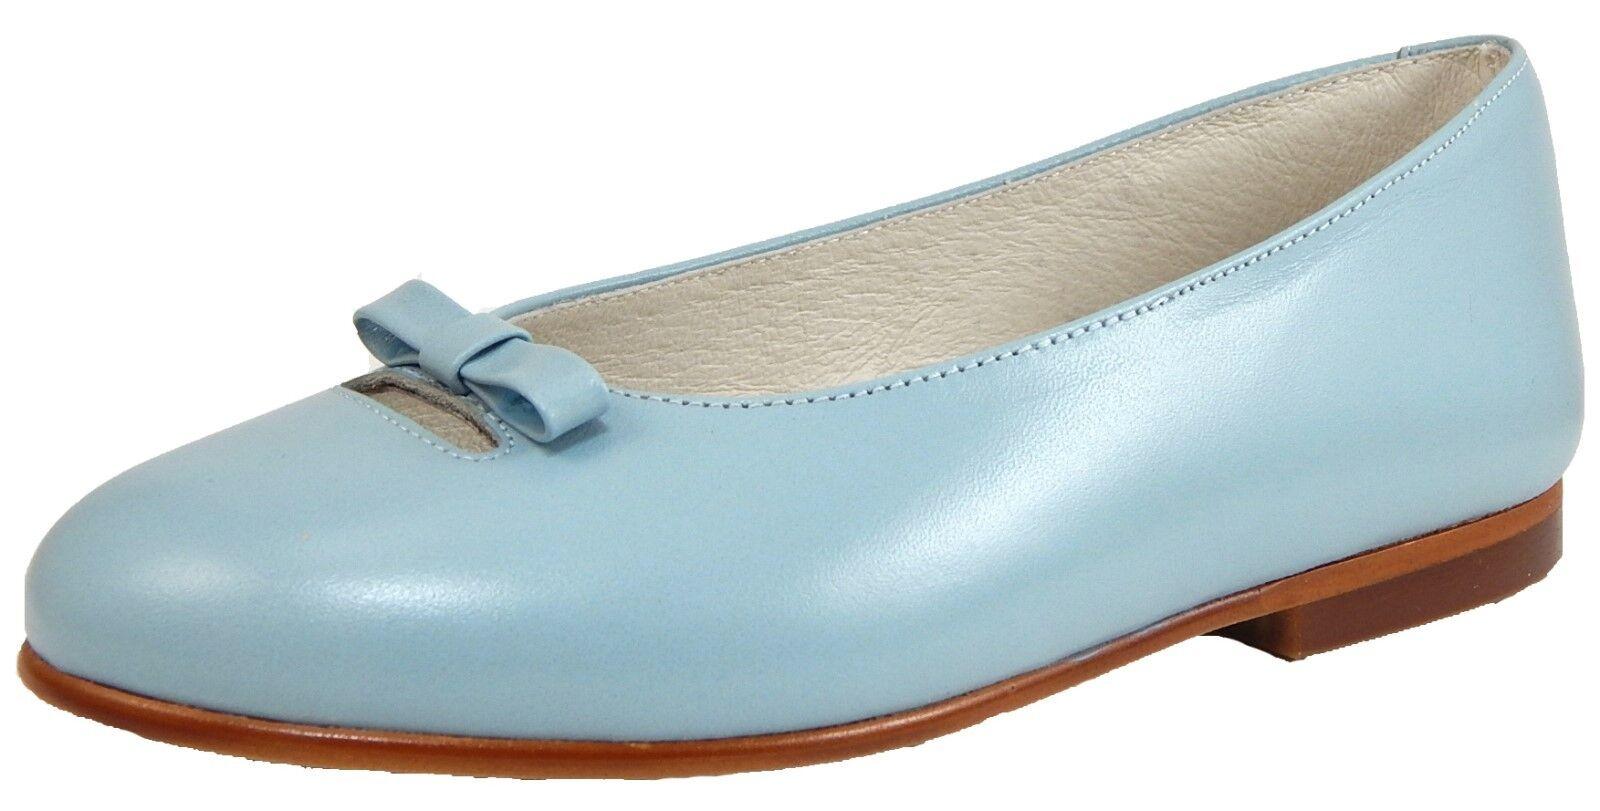 DE OSU S-1394 - Wouomo European Cloud blu Leather Ballet Flats - Dimensione 6-10